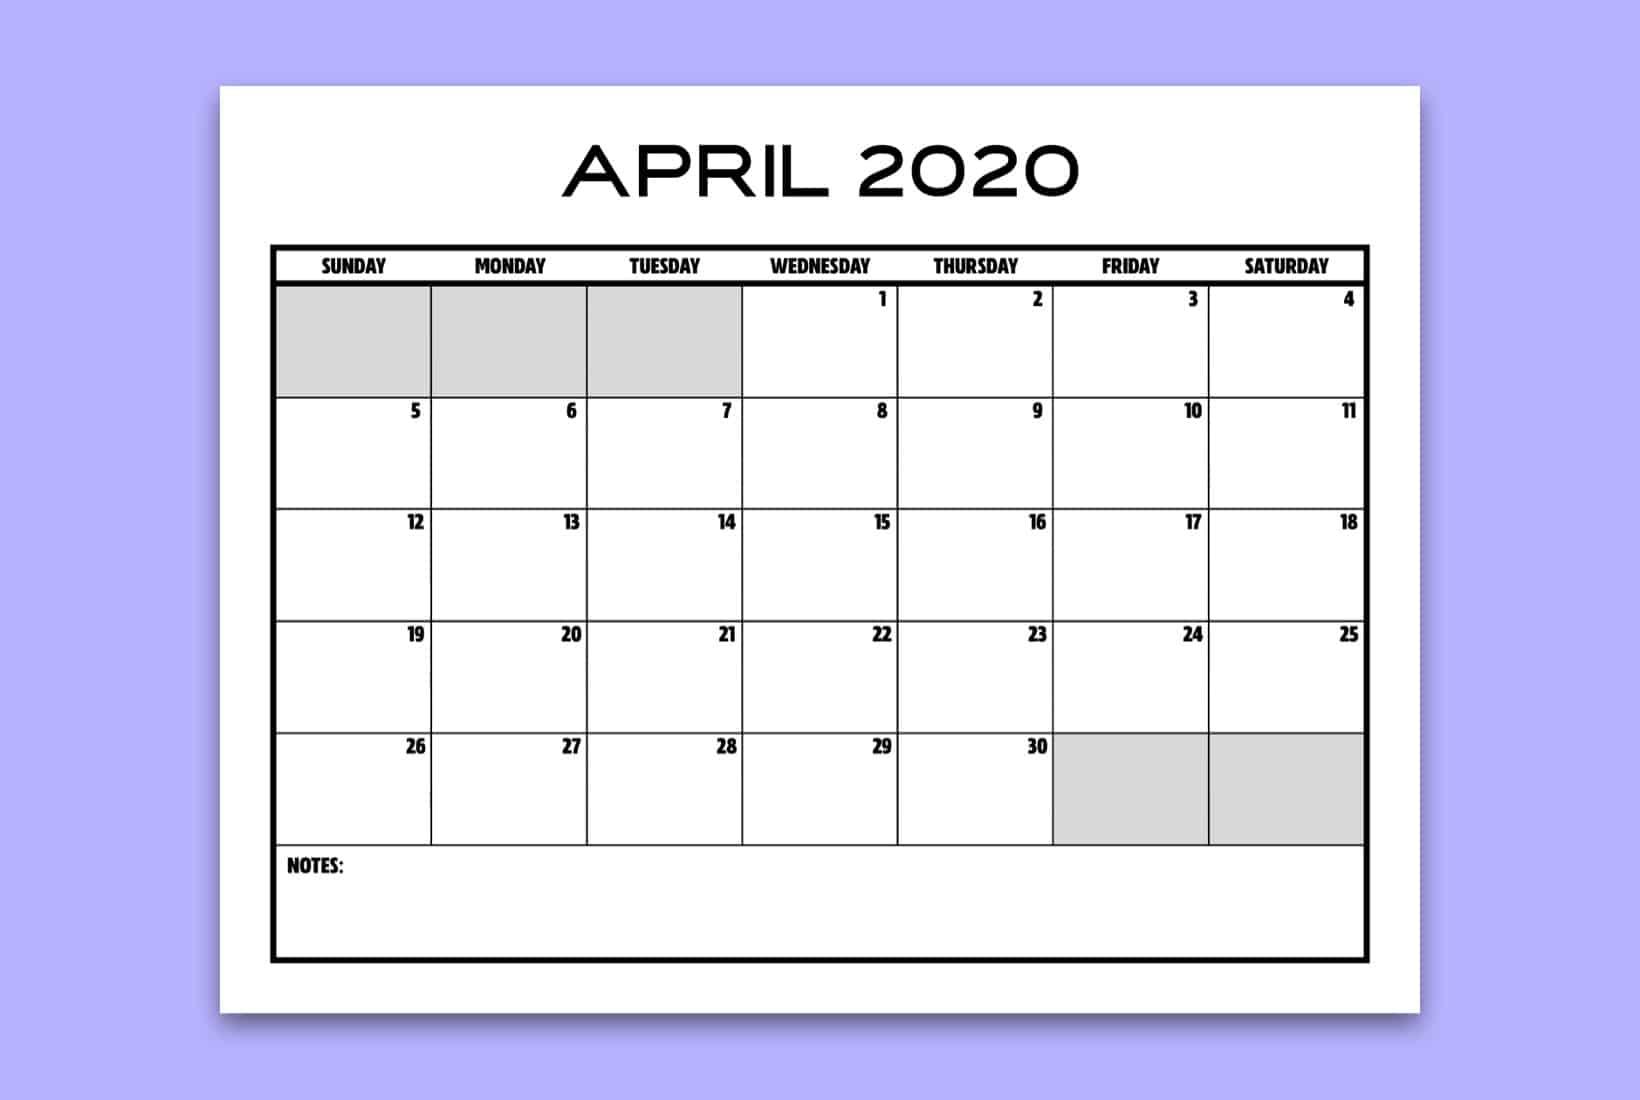 Free Printable Blank Calendar For 2020 - Crazy Laura